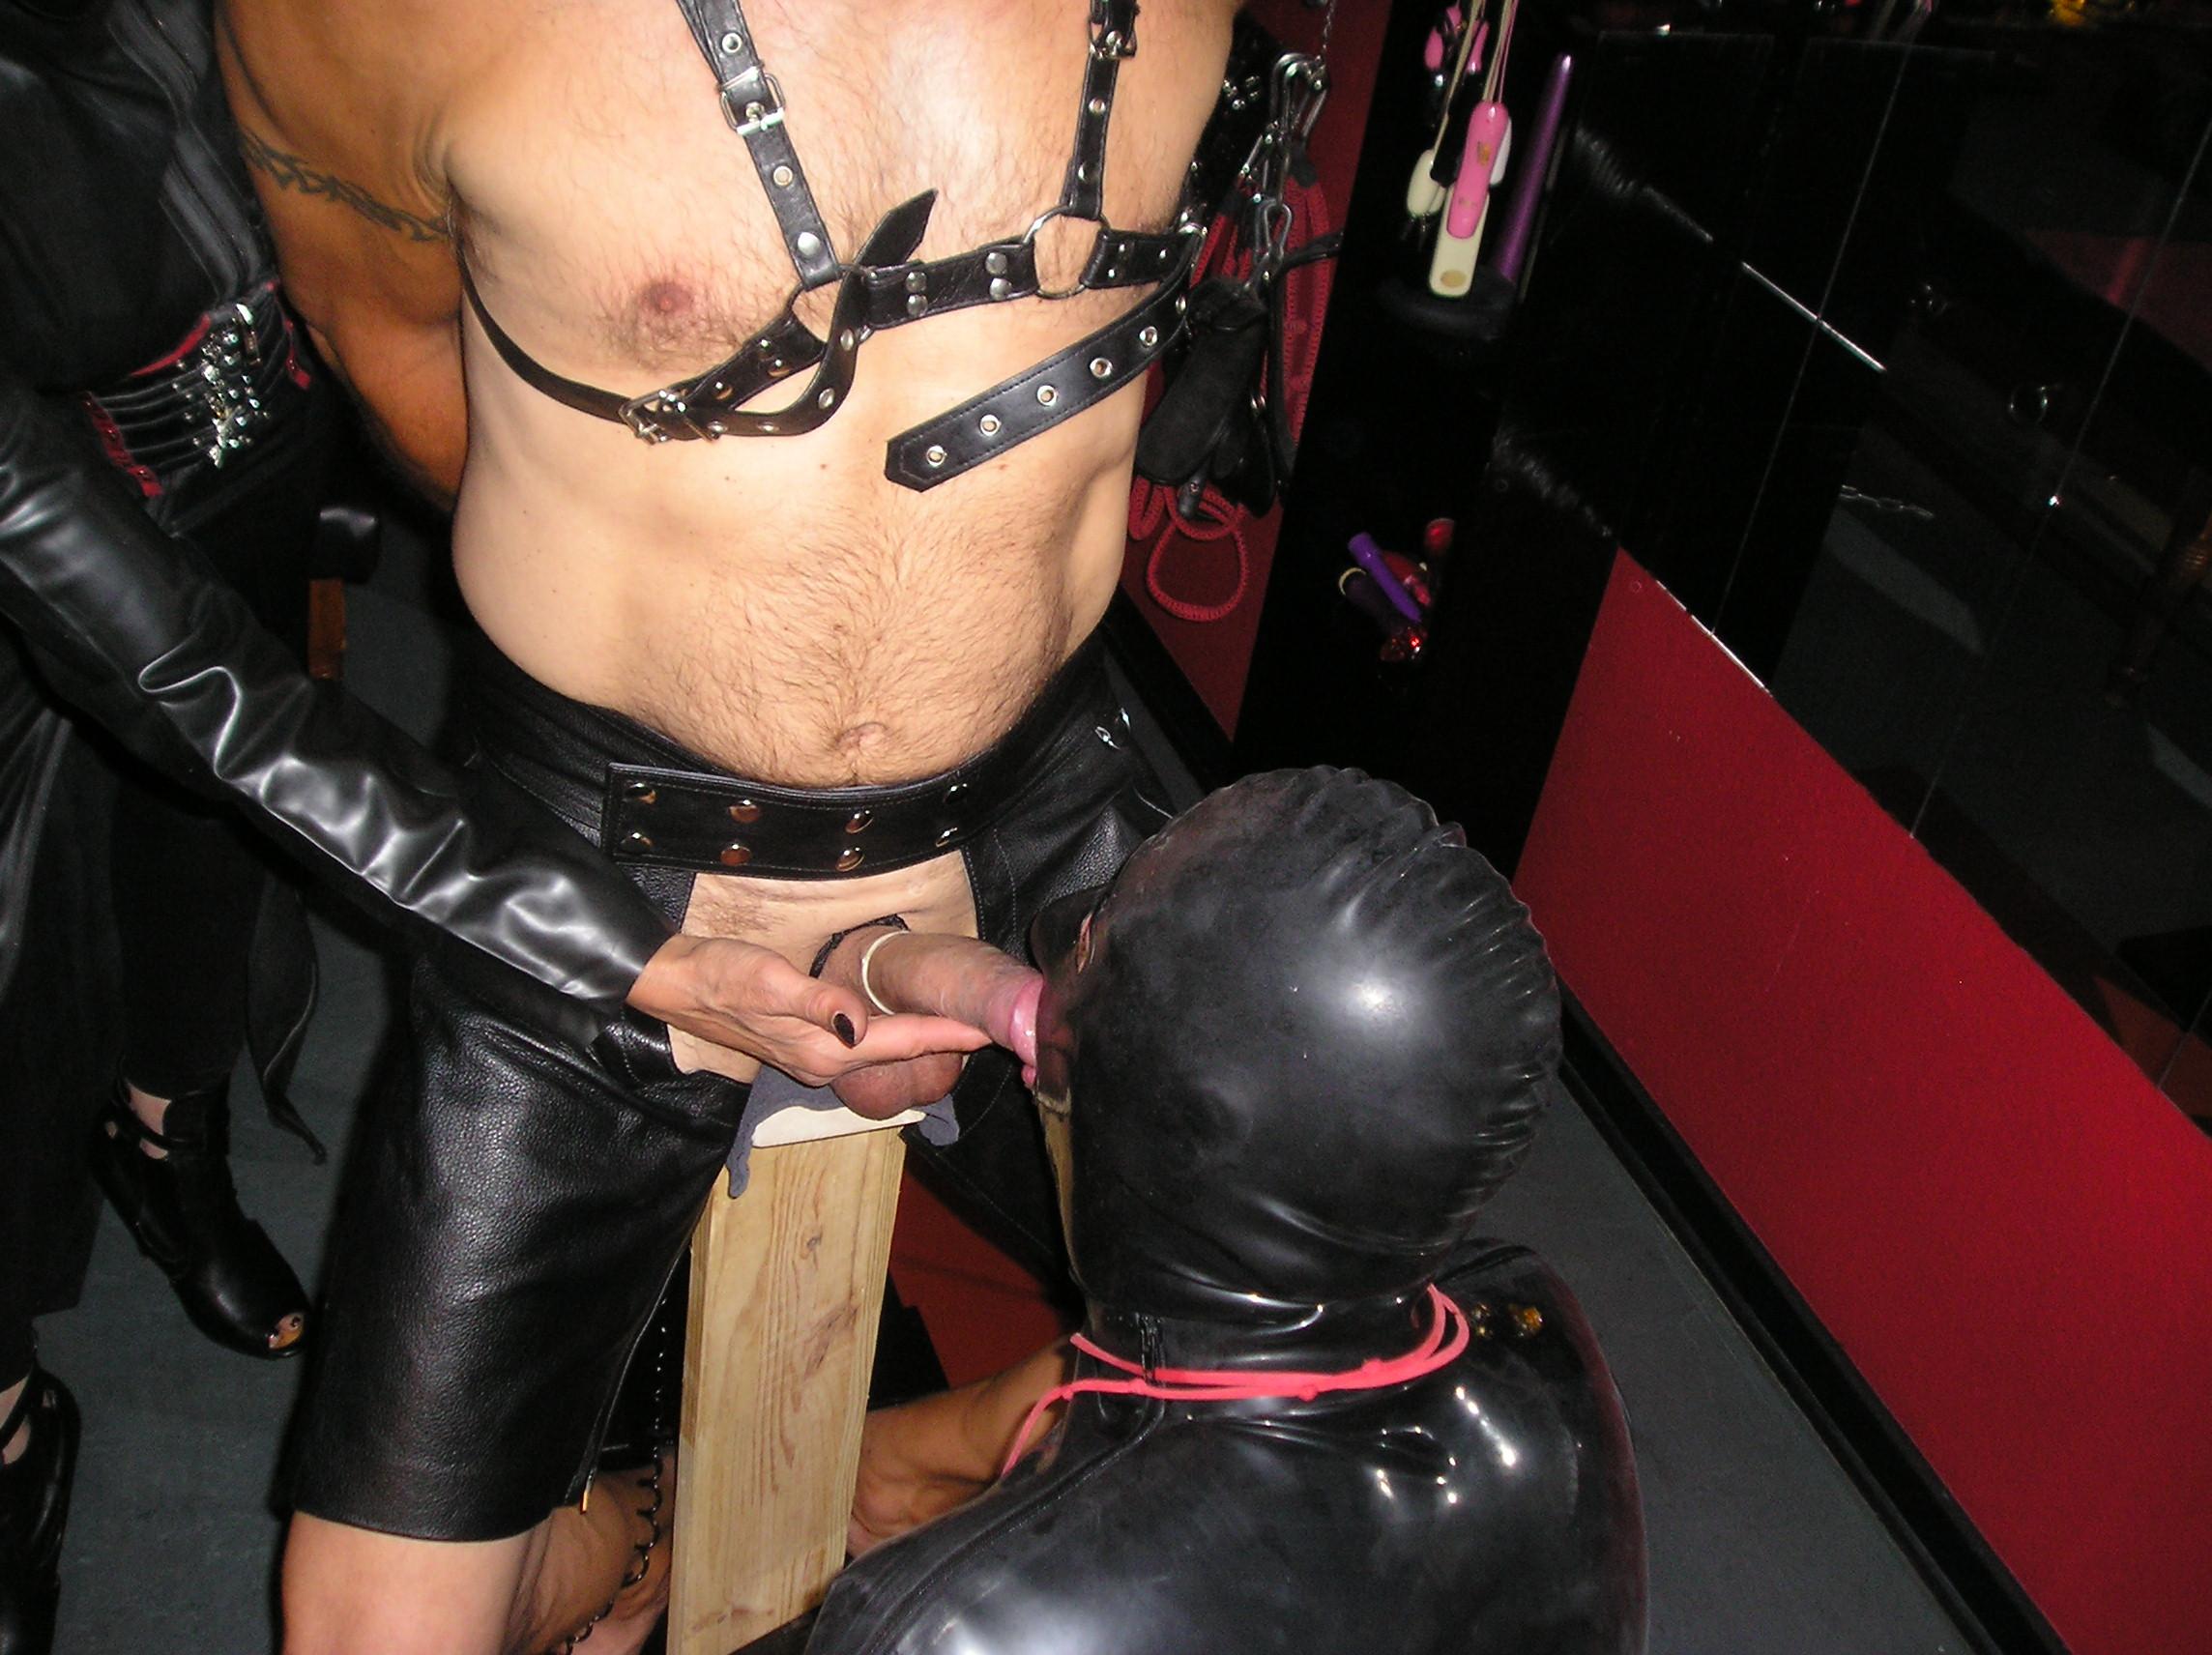 slavetøs slavesammenføring